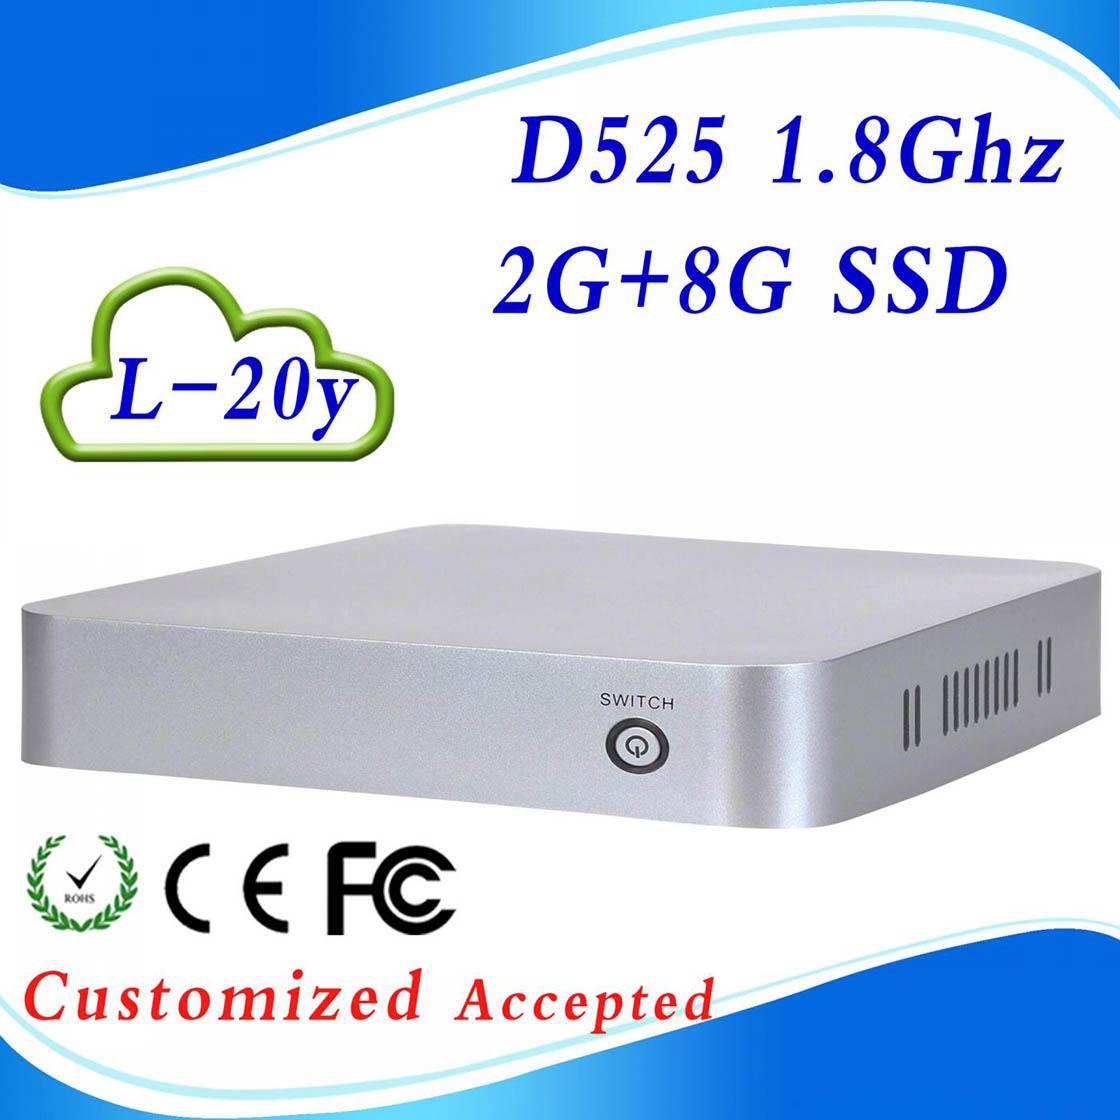 Mini computer smart tv box htpc mini computer 2G RAM 8G SSD INTEL D525 Atom Dual-core intel 3150 graphics Support WIN7, Linux,(China (Mainland))